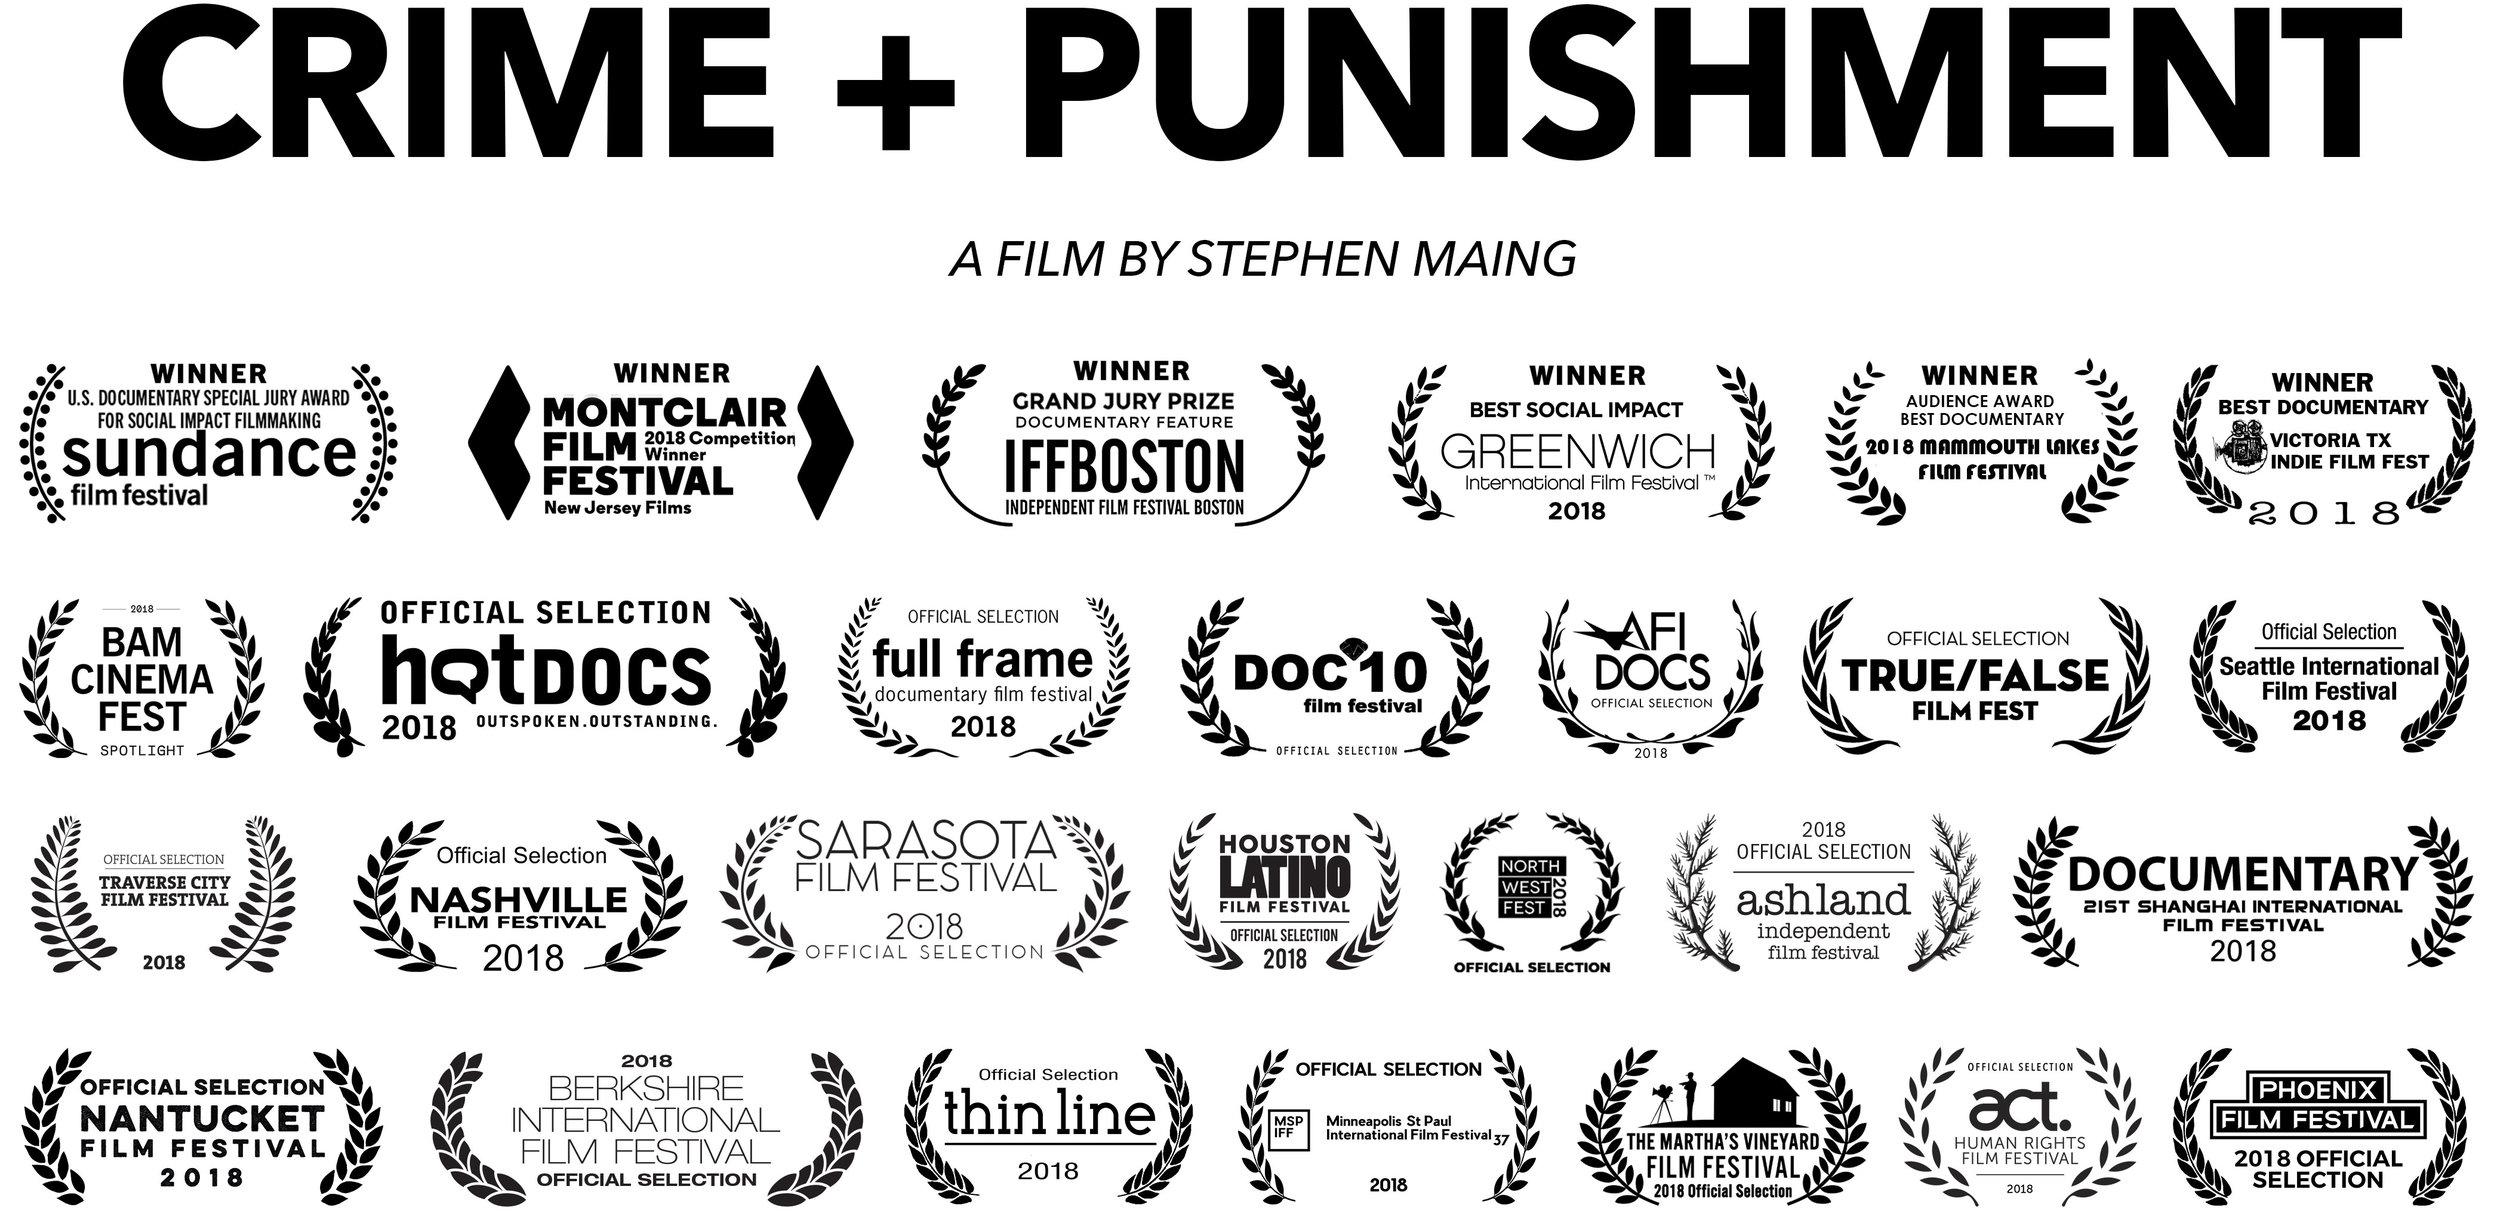 Crime and Punishment with Filmmaker Stephen Maing, Manuel Gomez (Private Investigator) plus George Weddington (Justice for Dahmeek)